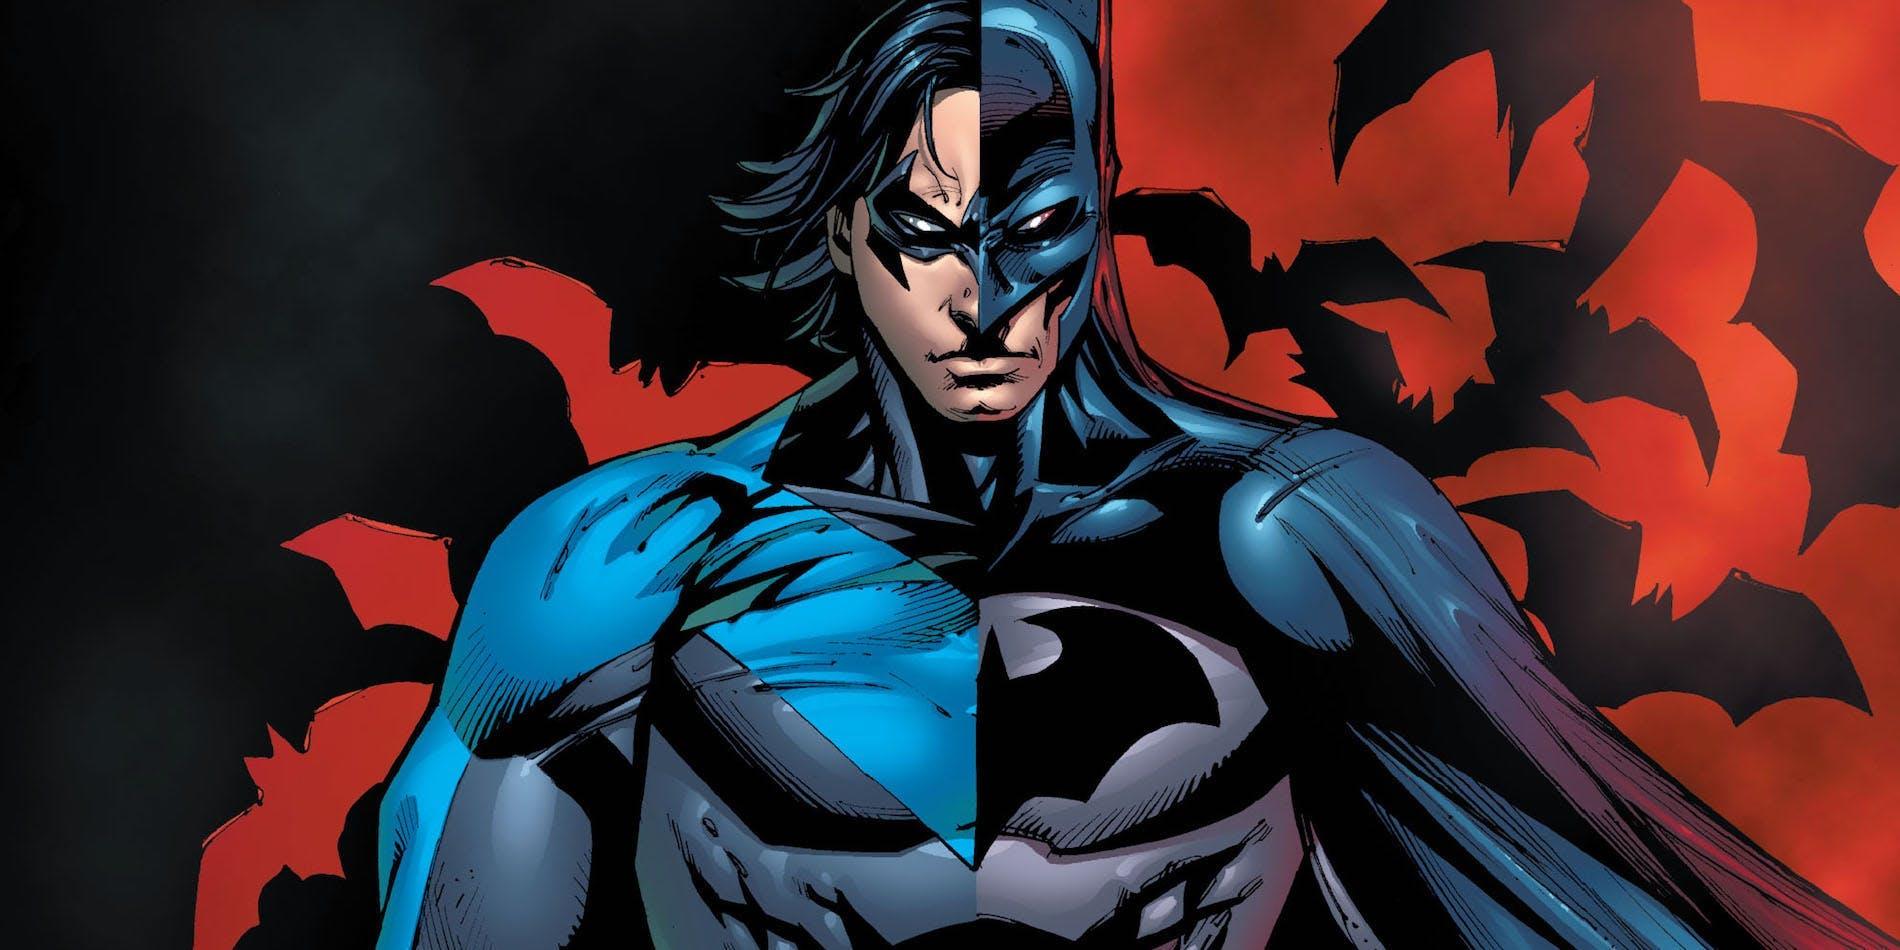 dick grayson as batman retrospective